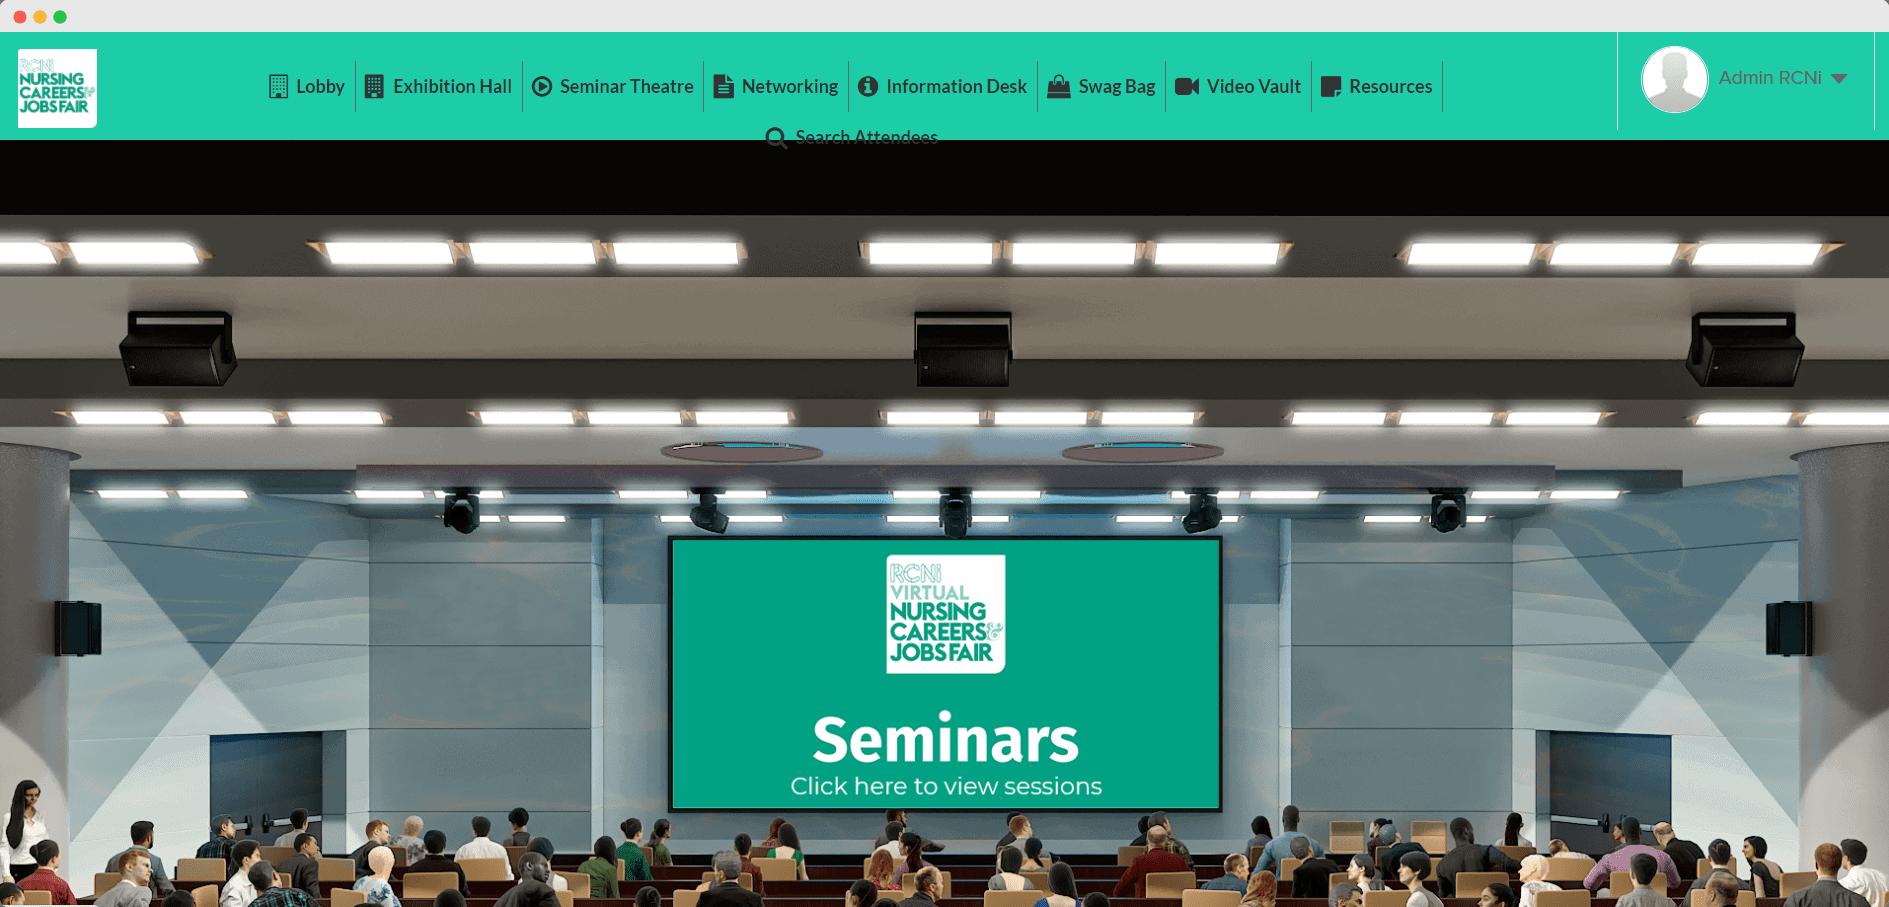 Virtual seminar theatre